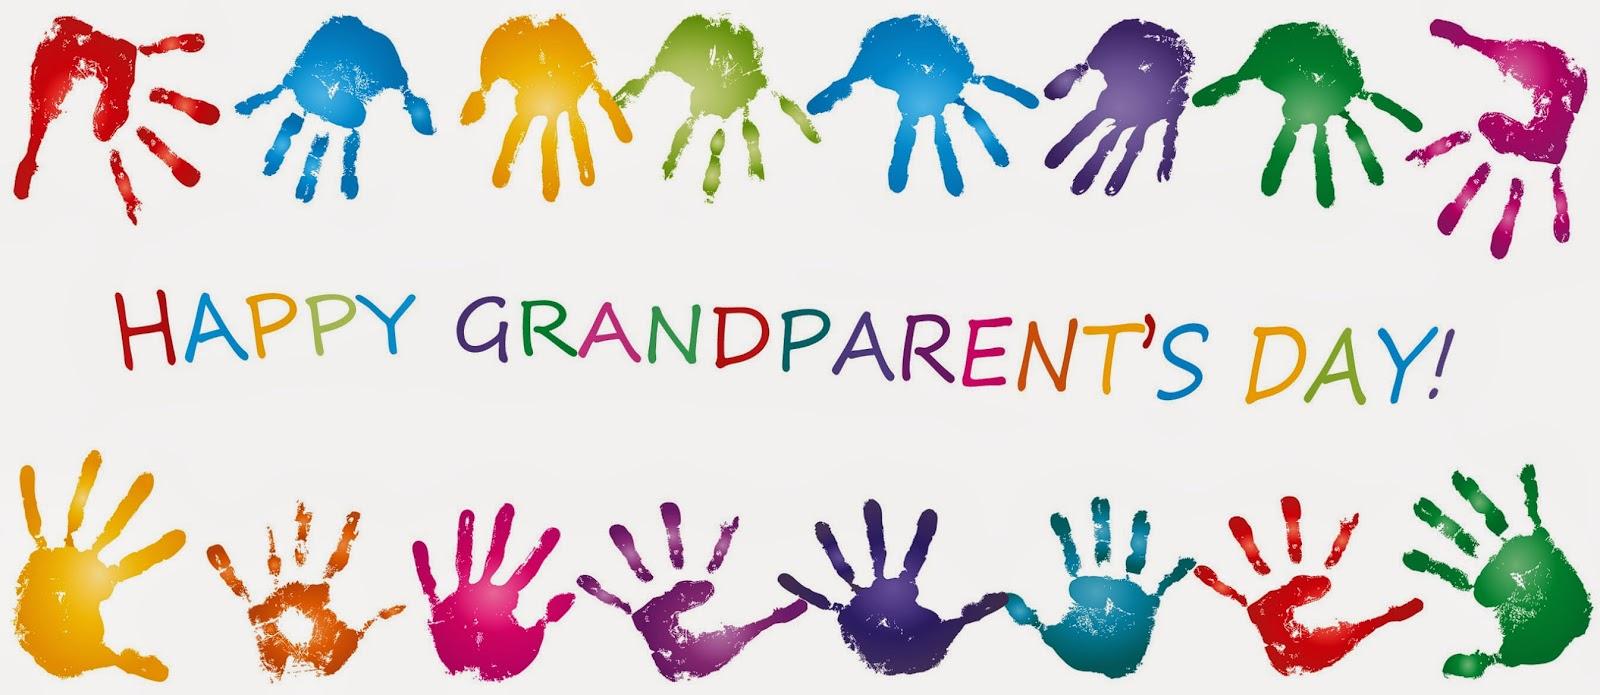 Grandparents Day On Pinterest